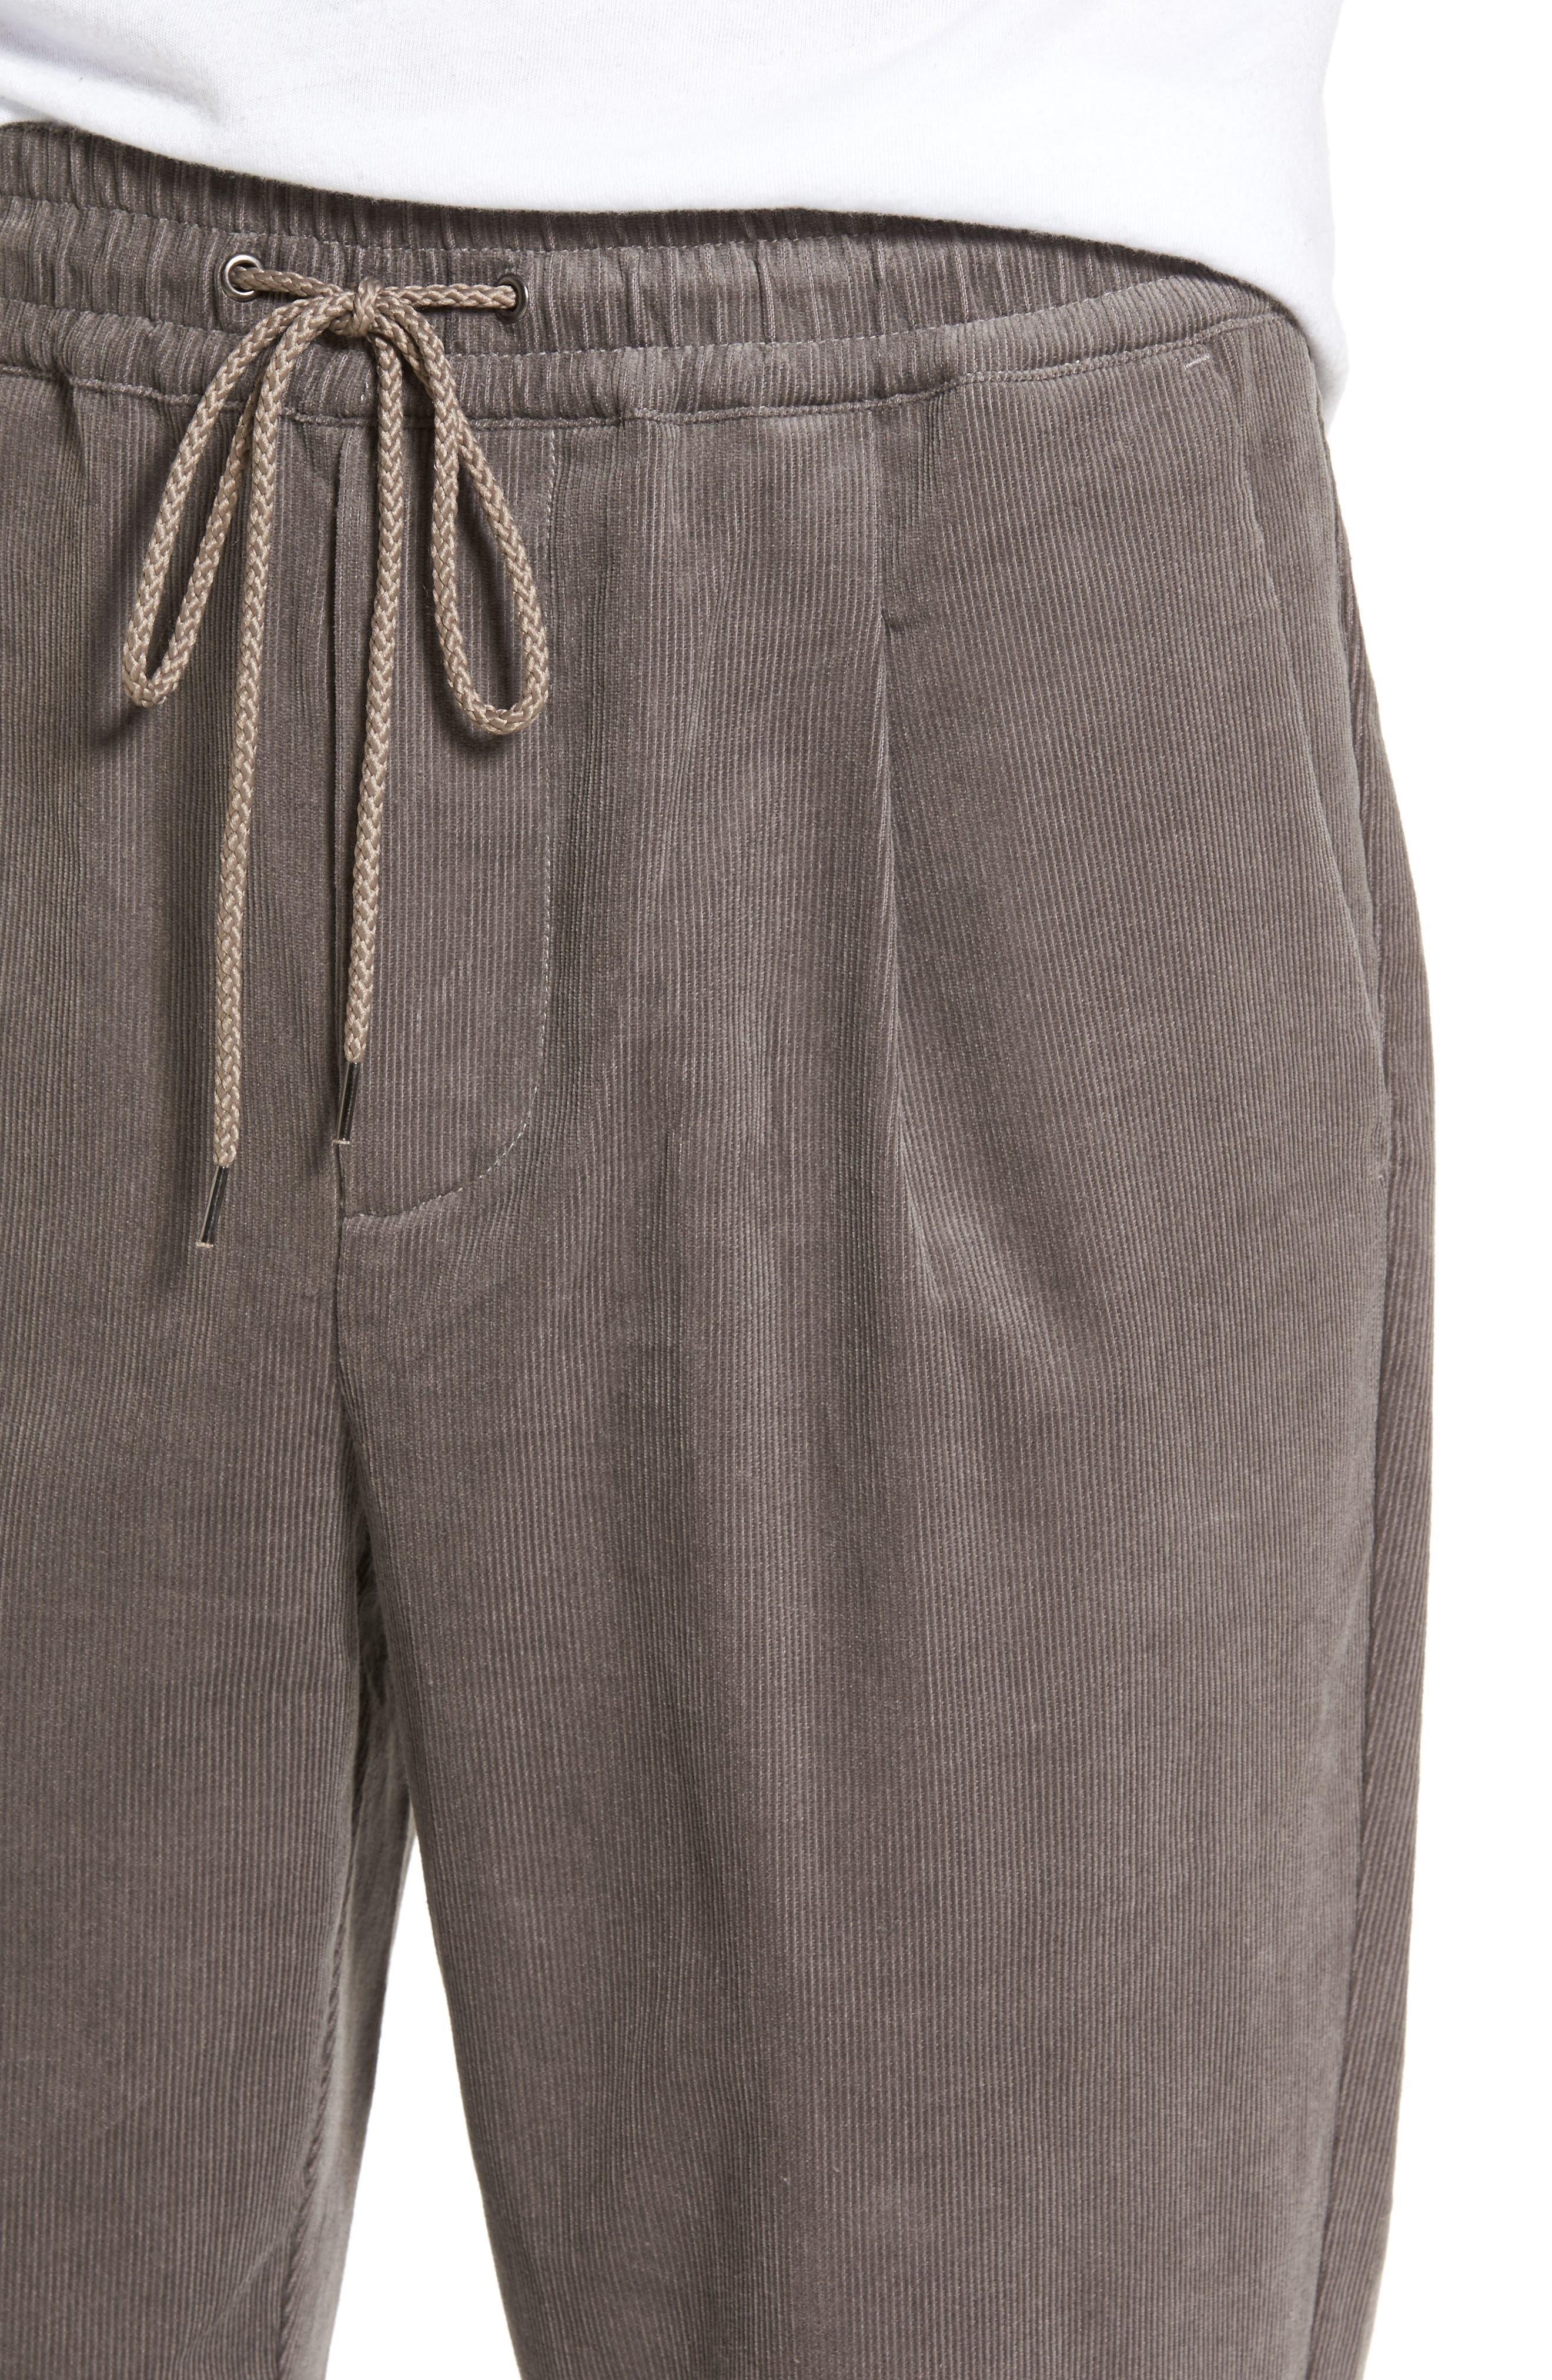 Astbury Crop Corduroy Pants,                             Alternate thumbnail 4, color,                             Grey